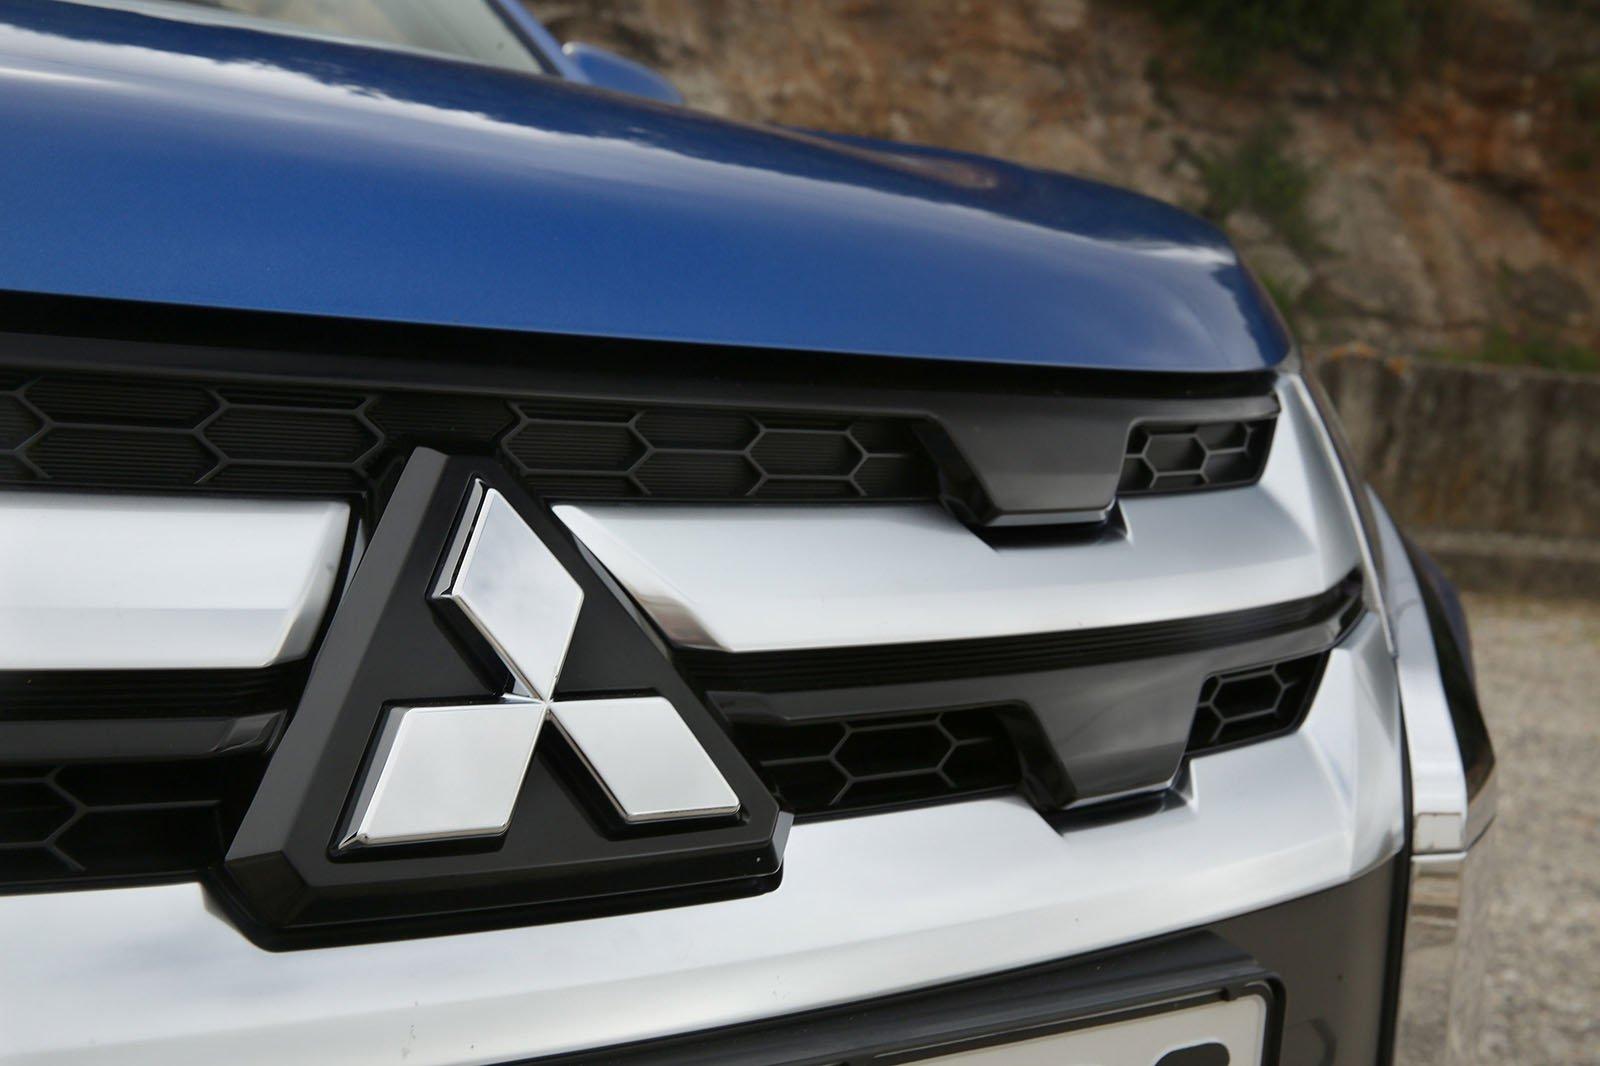 Mitsubishi ASX 2019 front grille detail